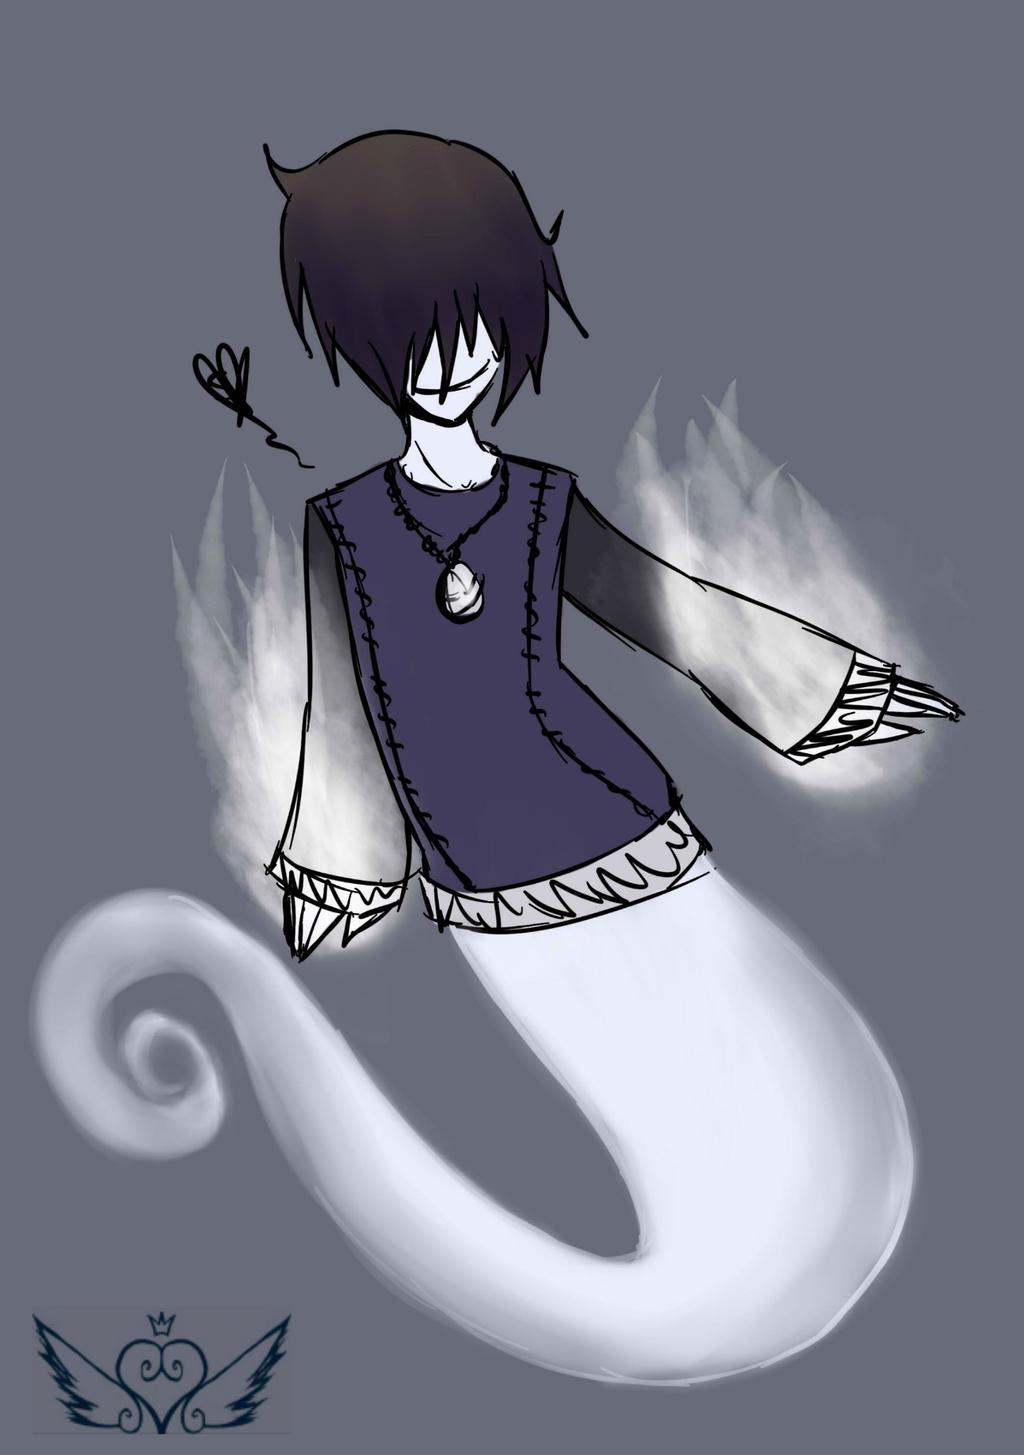 [HauntedManor] Ghost Boy by OpalesquePrincess